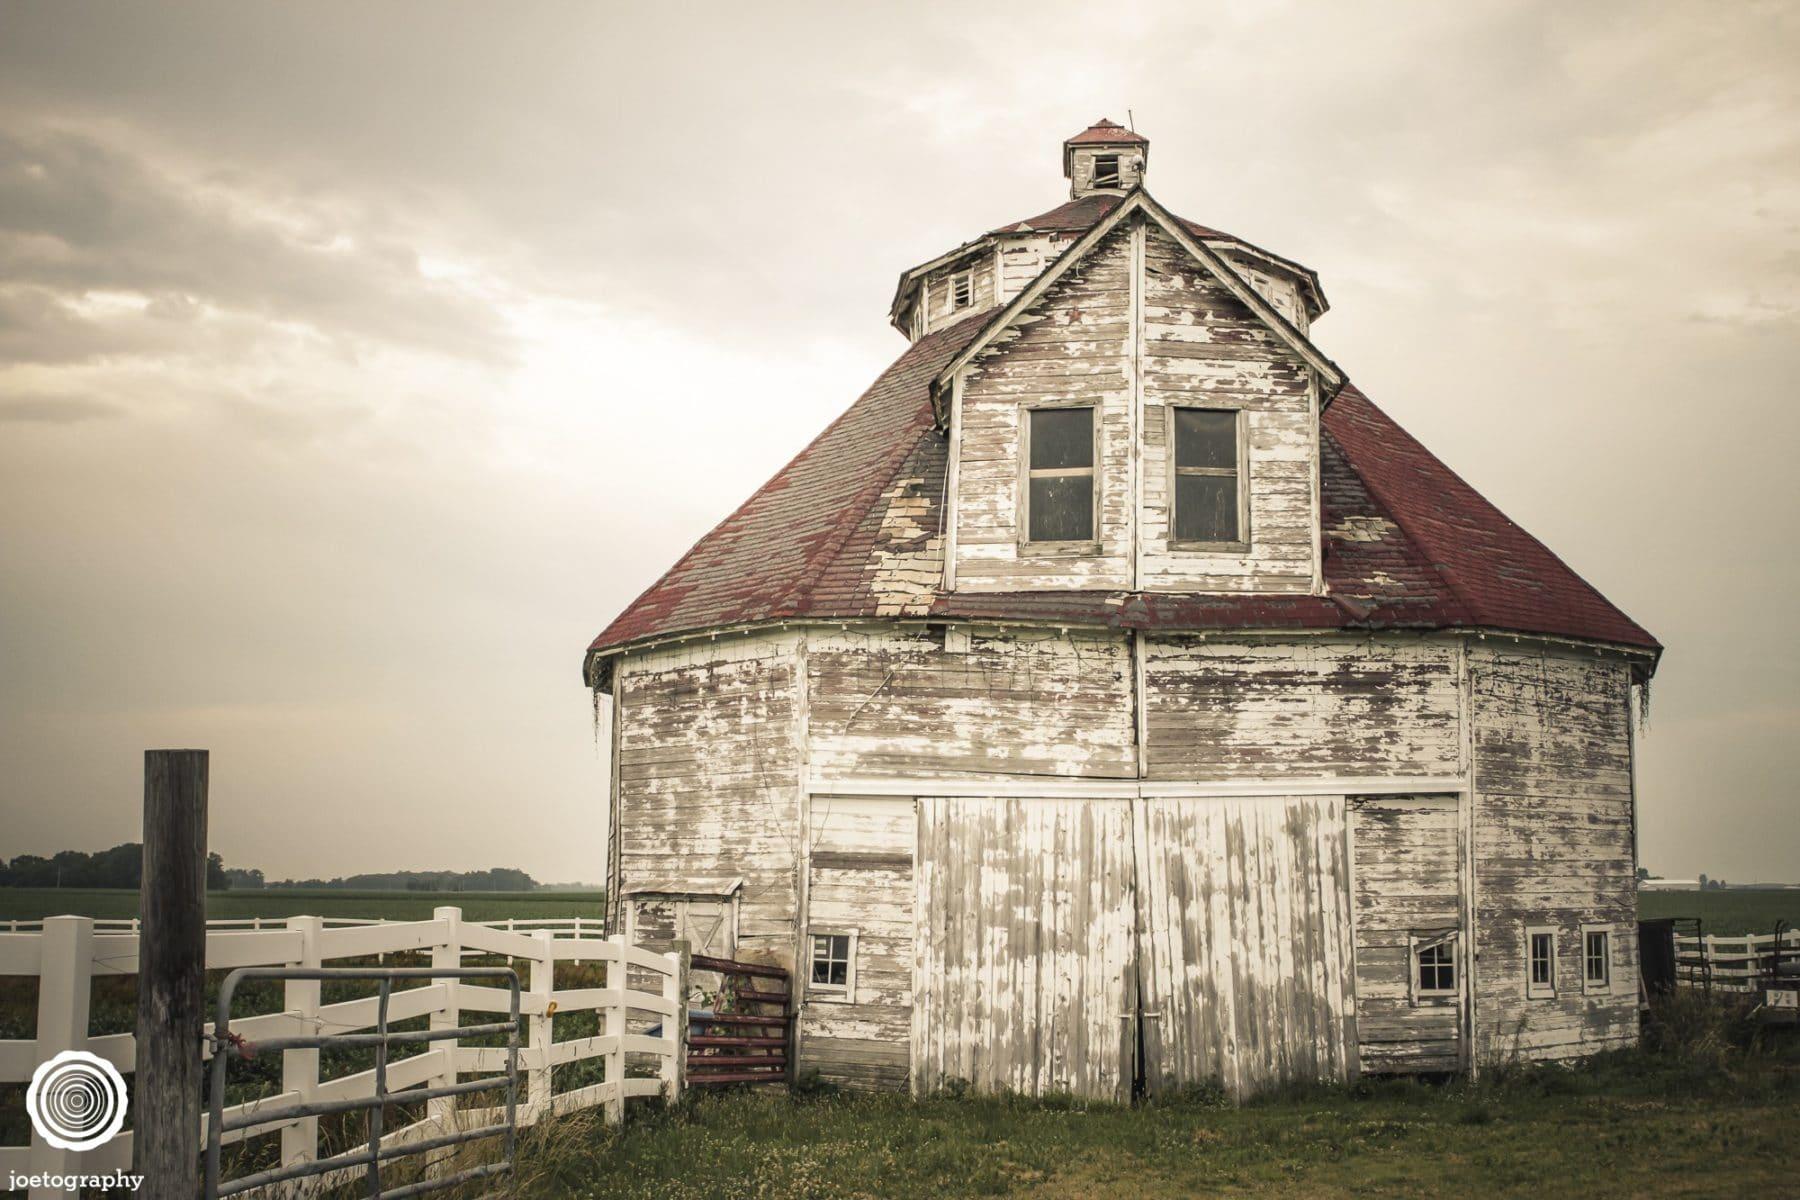 polygonal-barn-architecture-photos-shelbyville-indiana-5